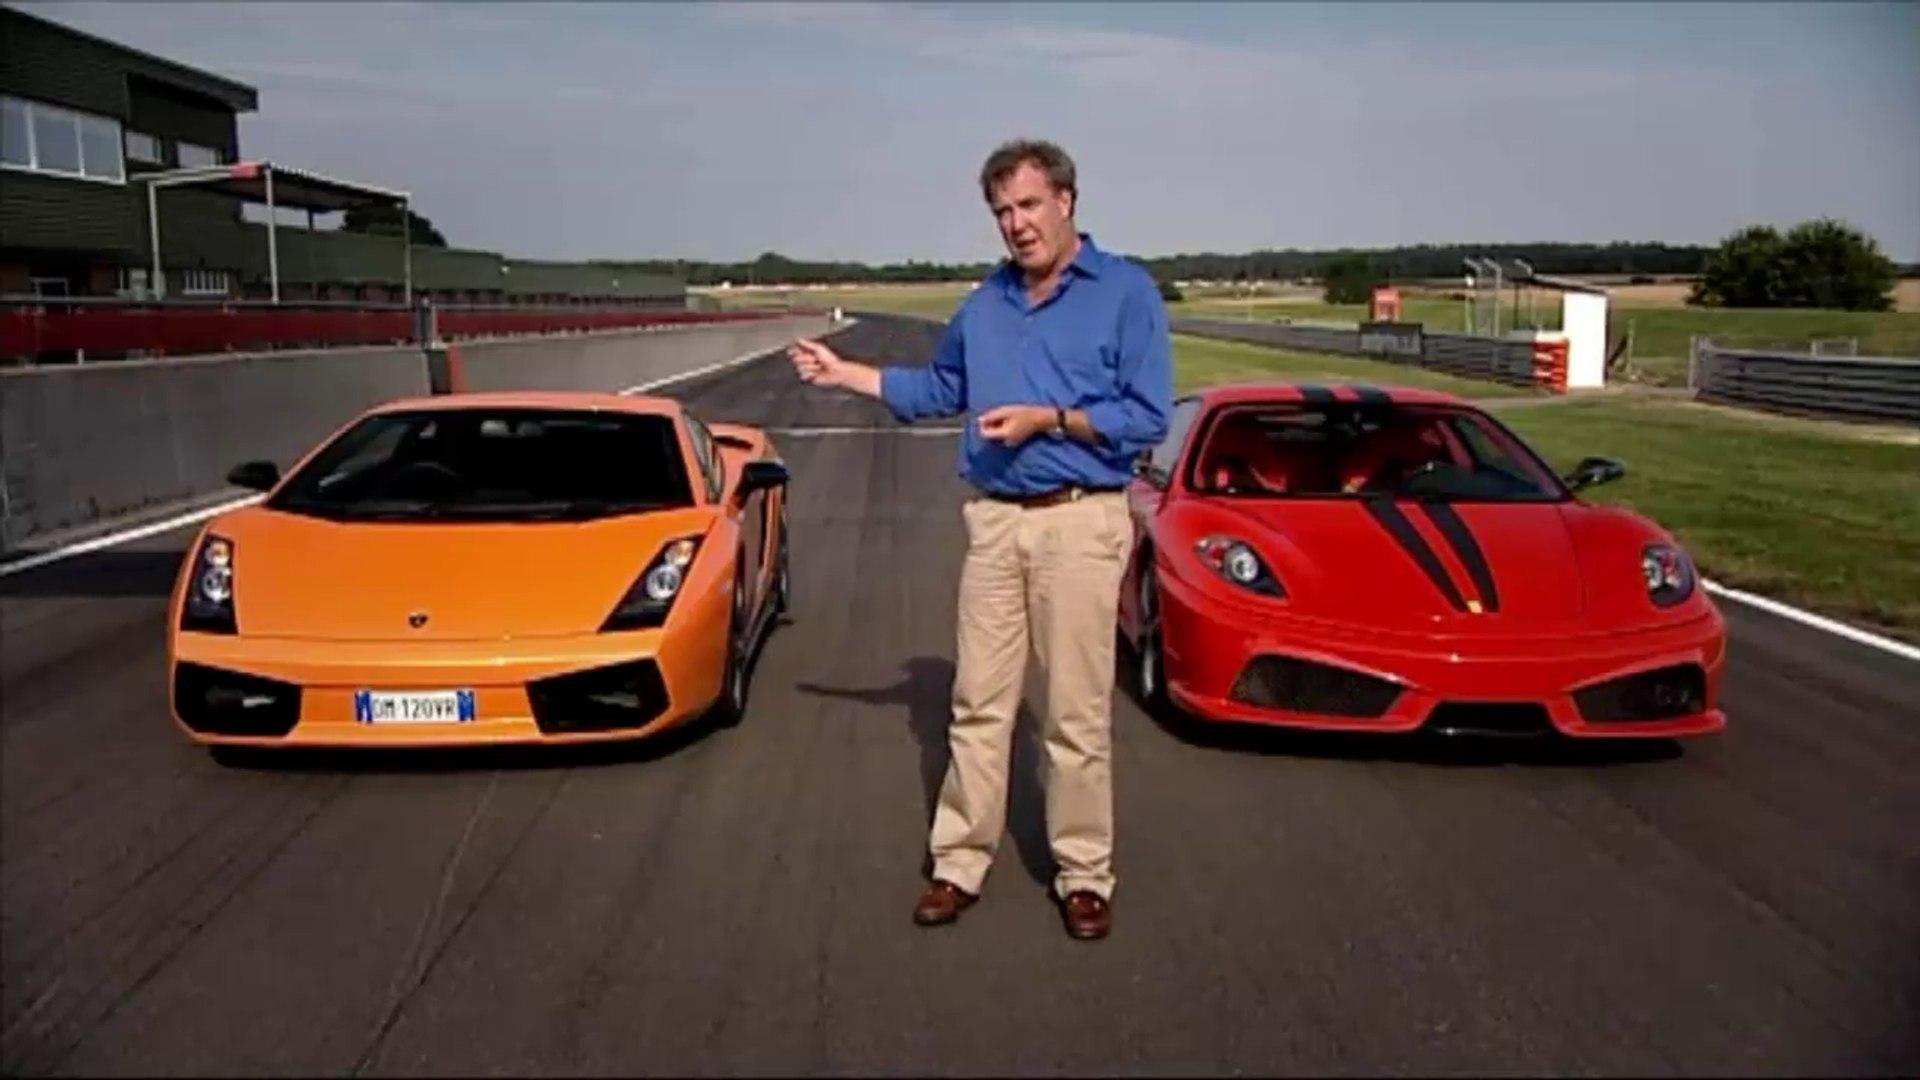 Lamborghini Gallardo Vs Ferrari F430 Jeremy Clarkson Show Video Dailymotion